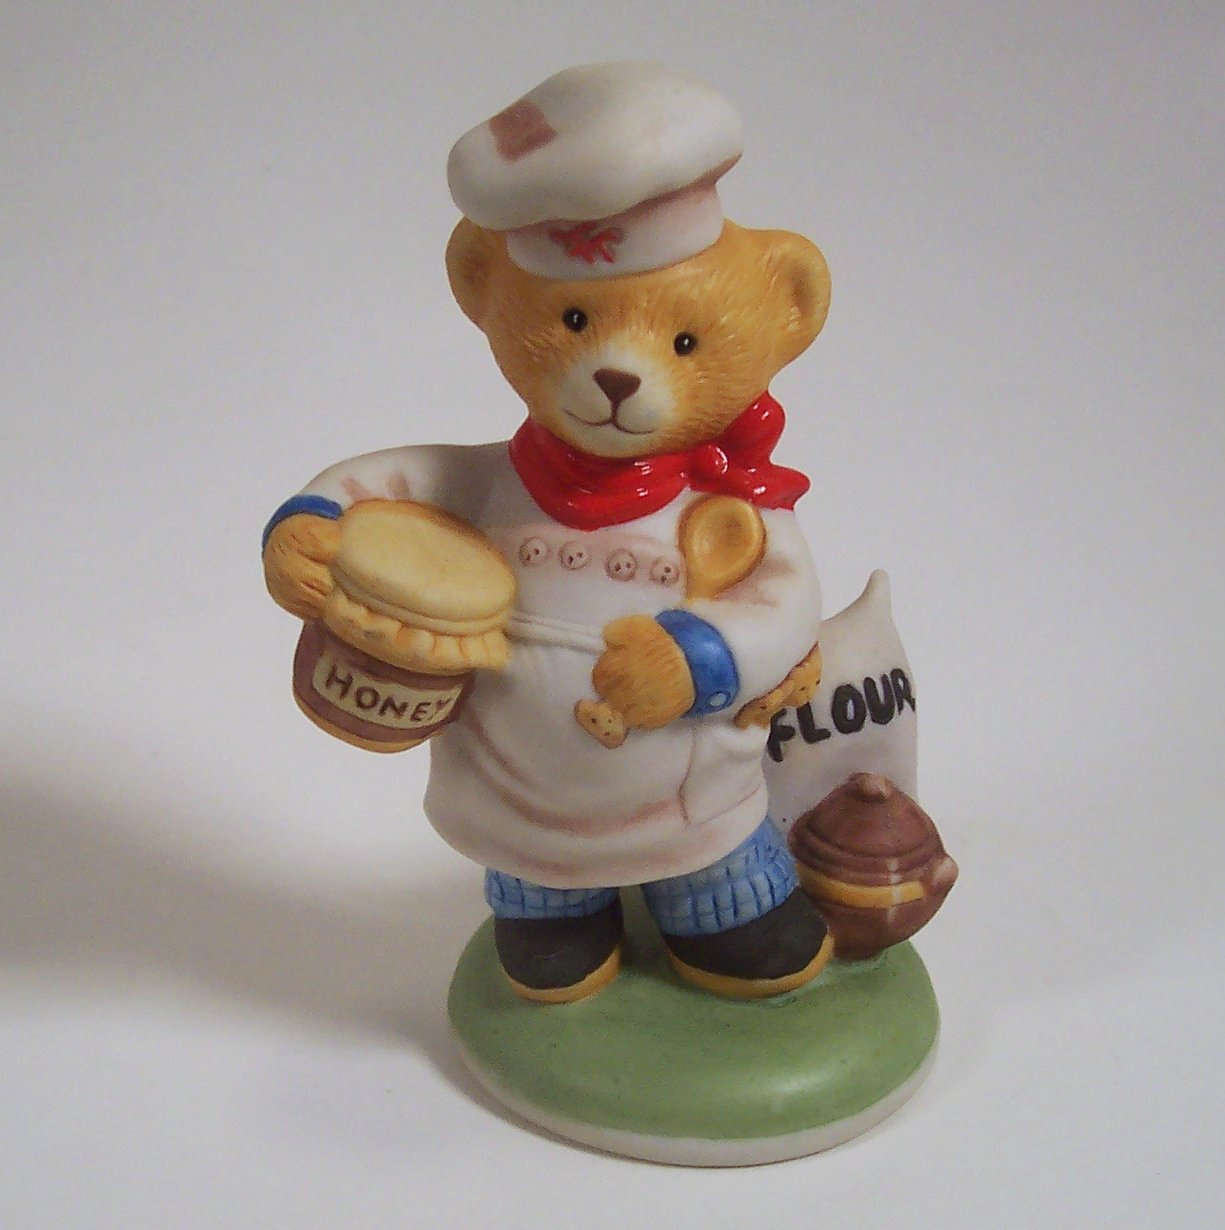 Chef Pierre Teddington Hotel 1986 Franklin Mint Porcelain Figurine